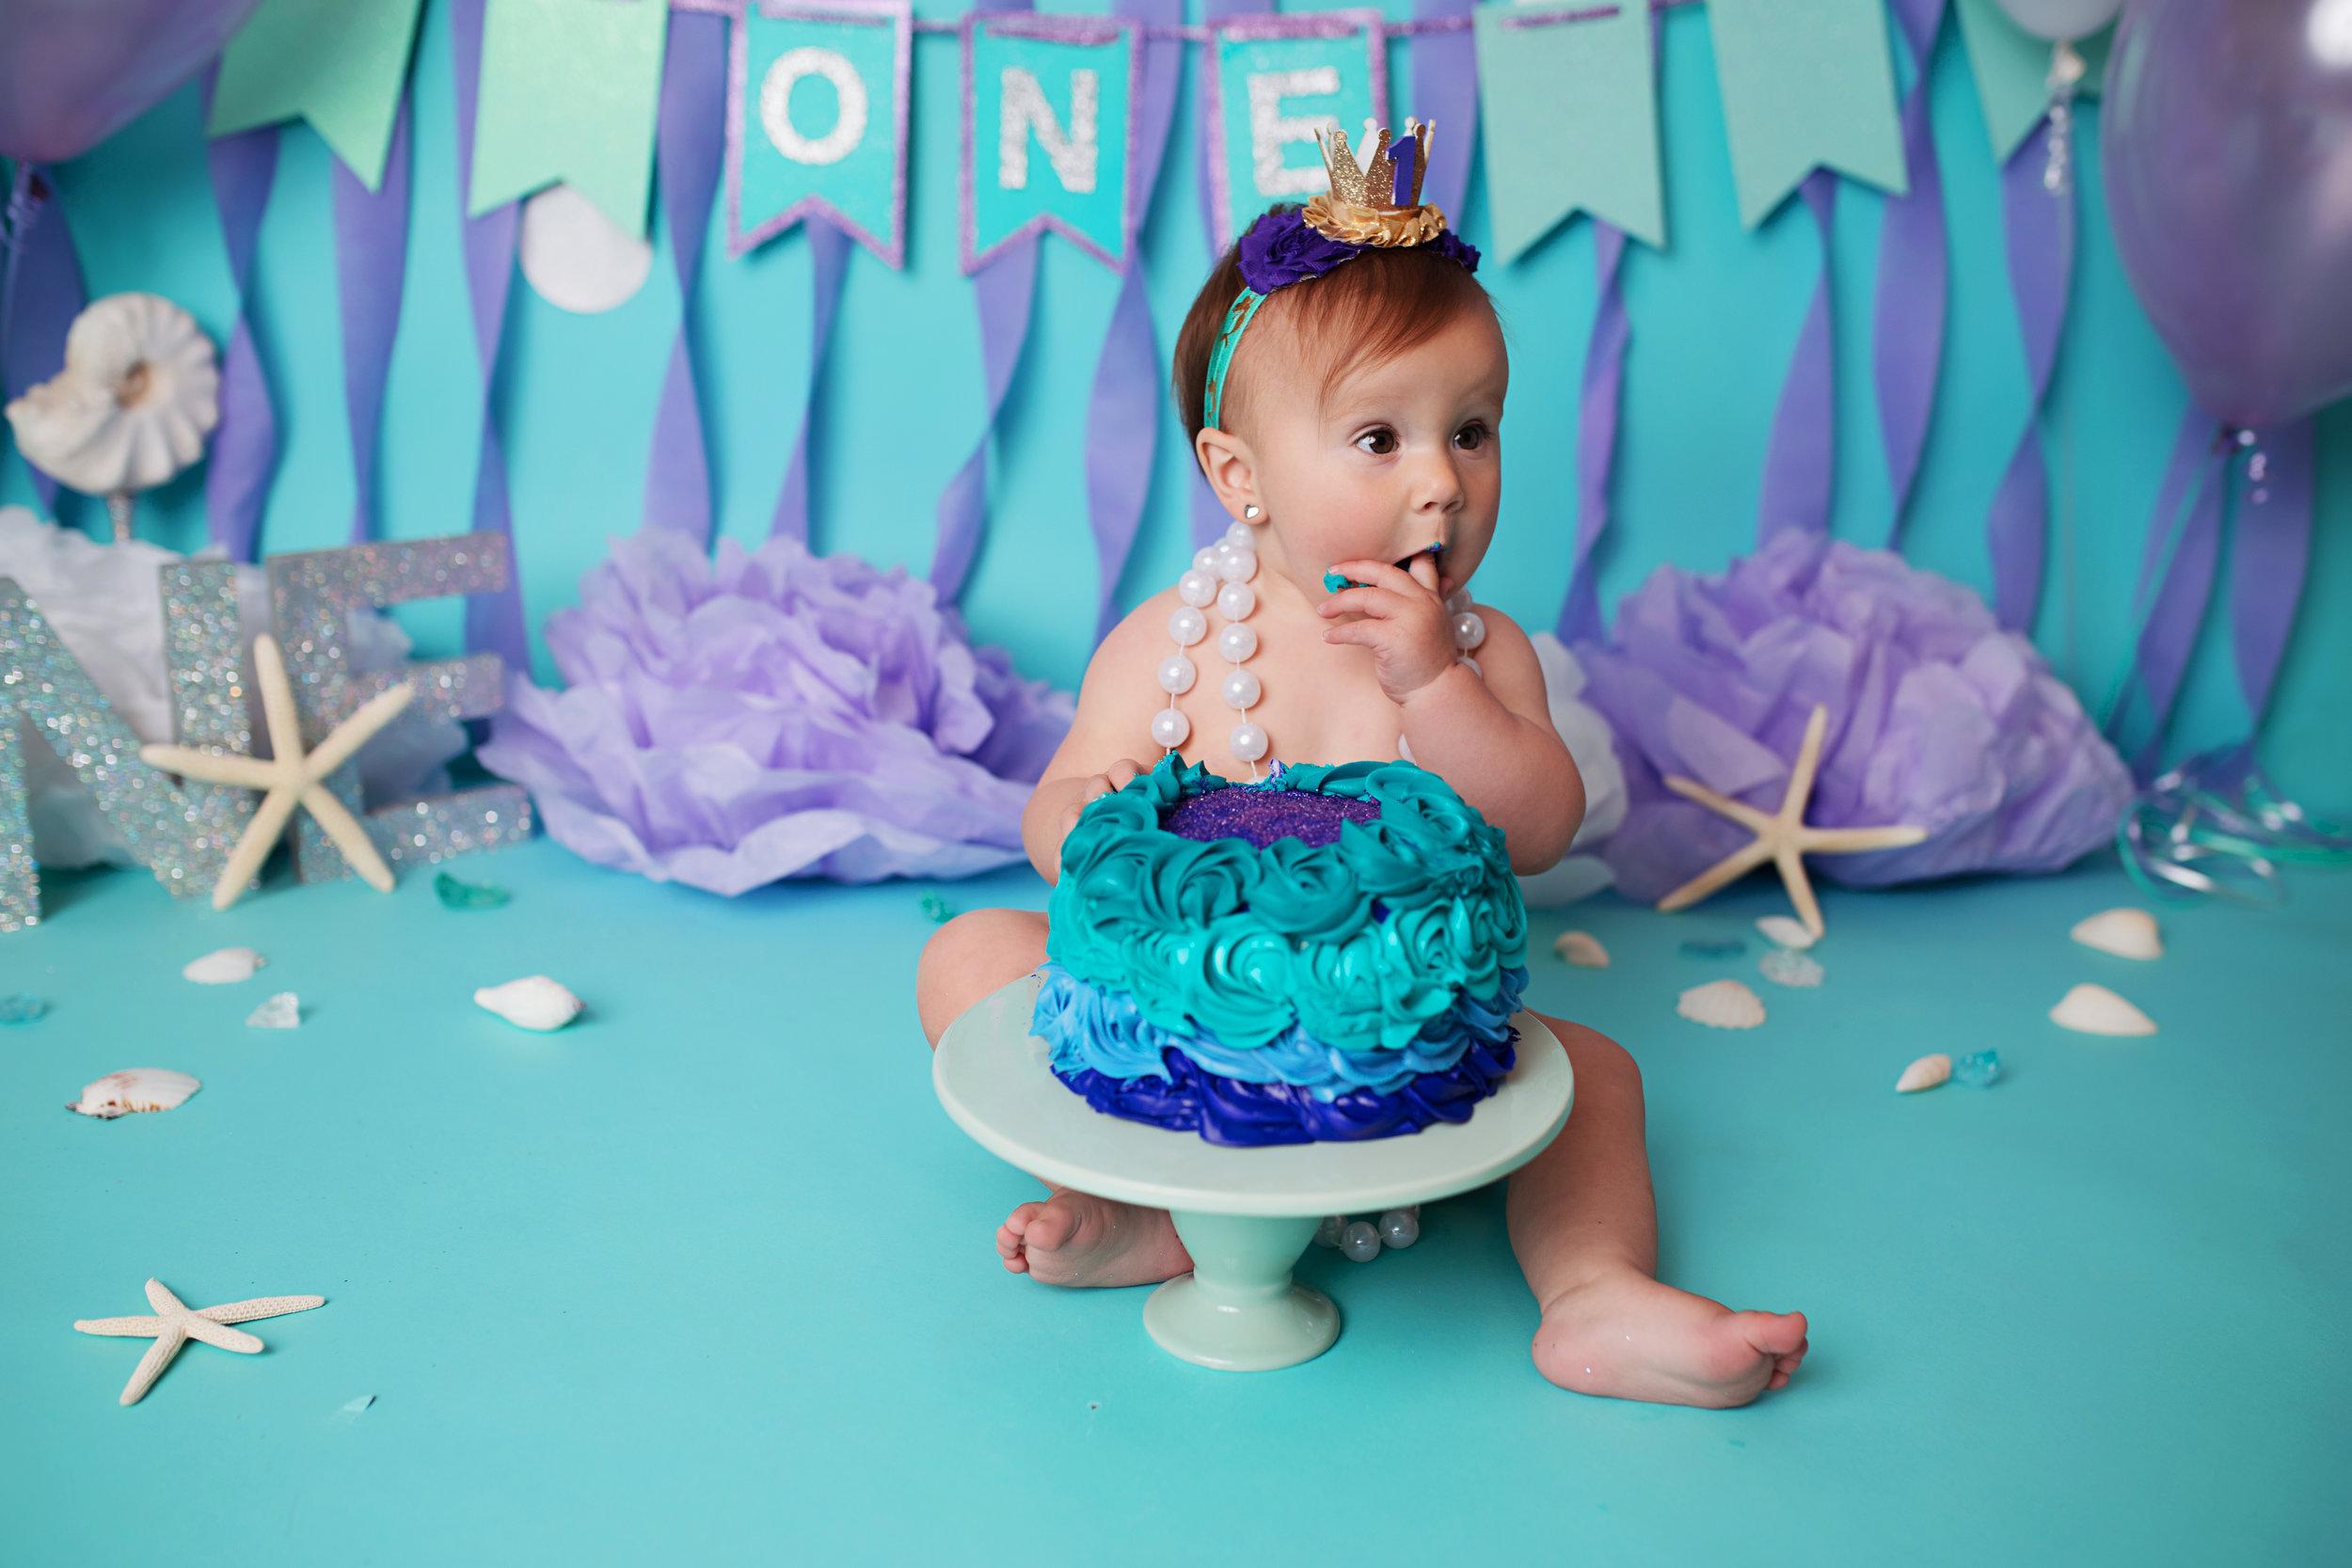 anchorage-cake-smash-photography-7.jpg